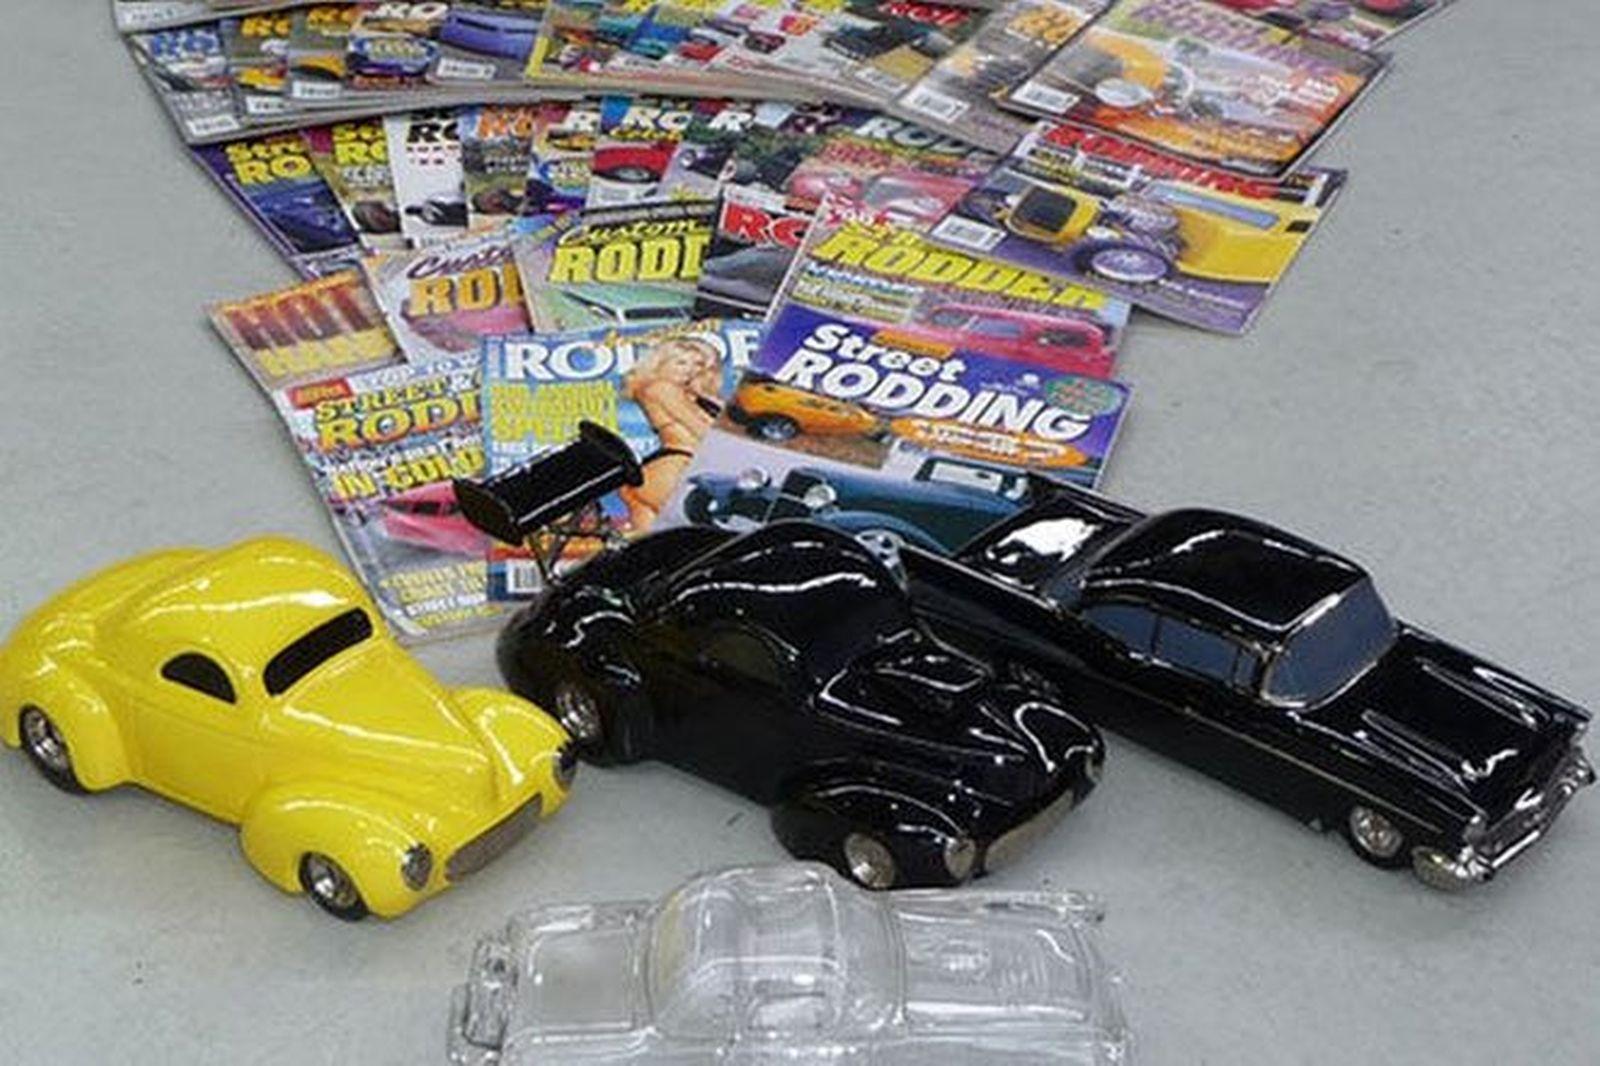 Sold Model Cars Magazines 1957 Chevrolet 1955 Thunderbird 2 Hot Rod Rods 40